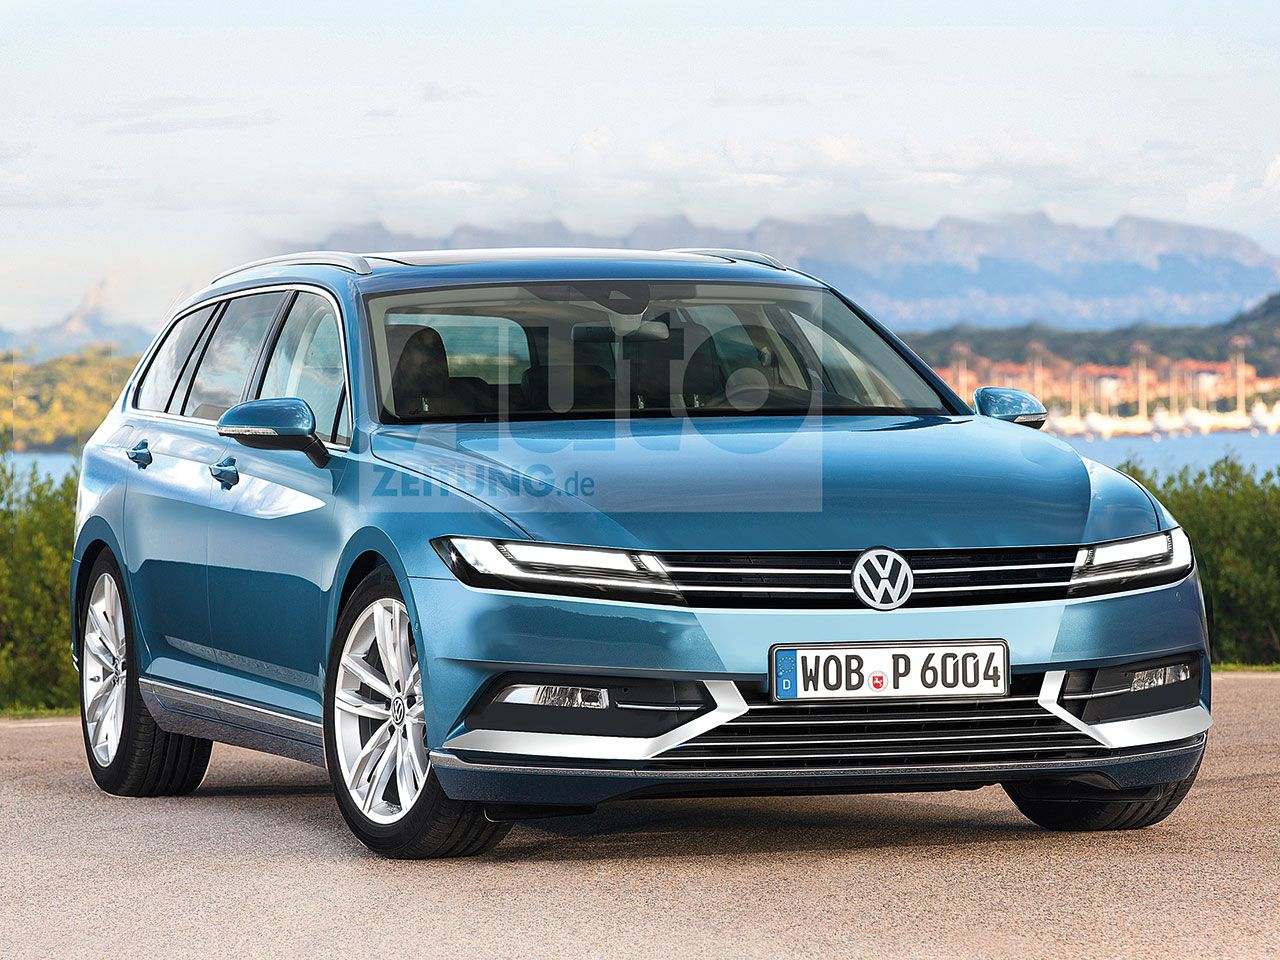 Vw Passat Variant B9 2021 Erste Informationen Vw Passat Vw Passat Variant Volkswagen